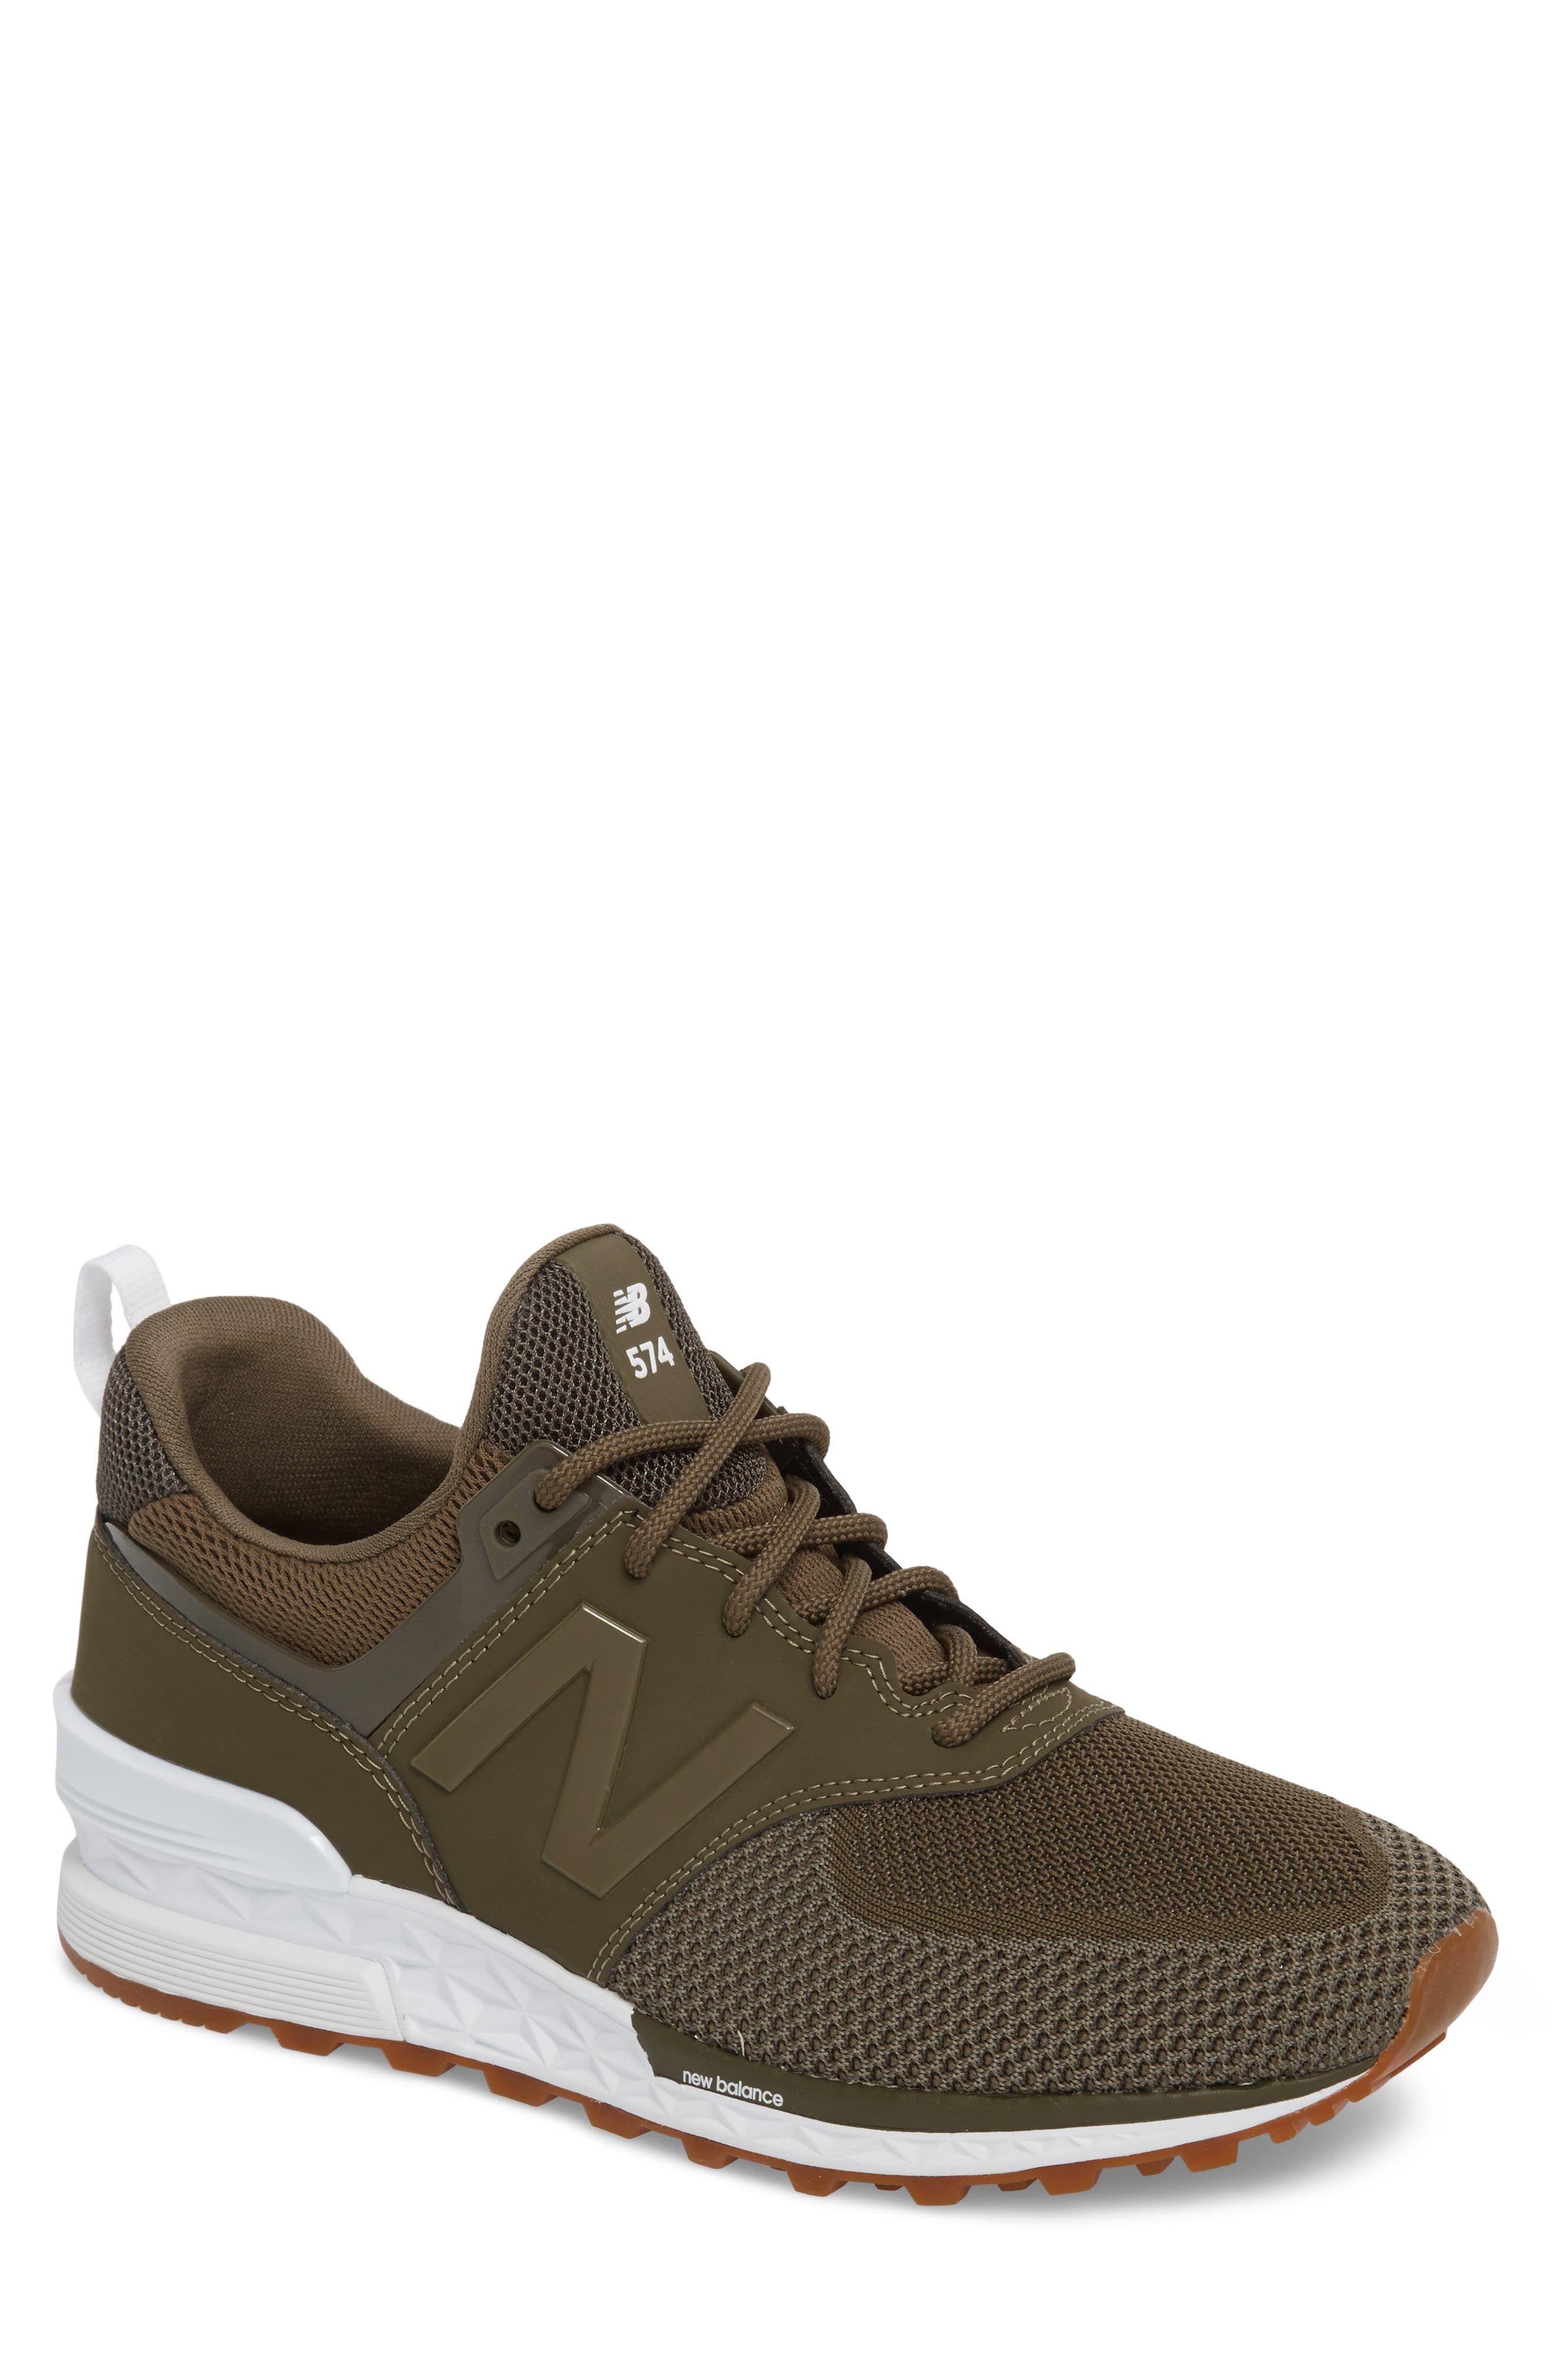 574 Engineered Mesh Sneaker,                         Main,                         color, 338